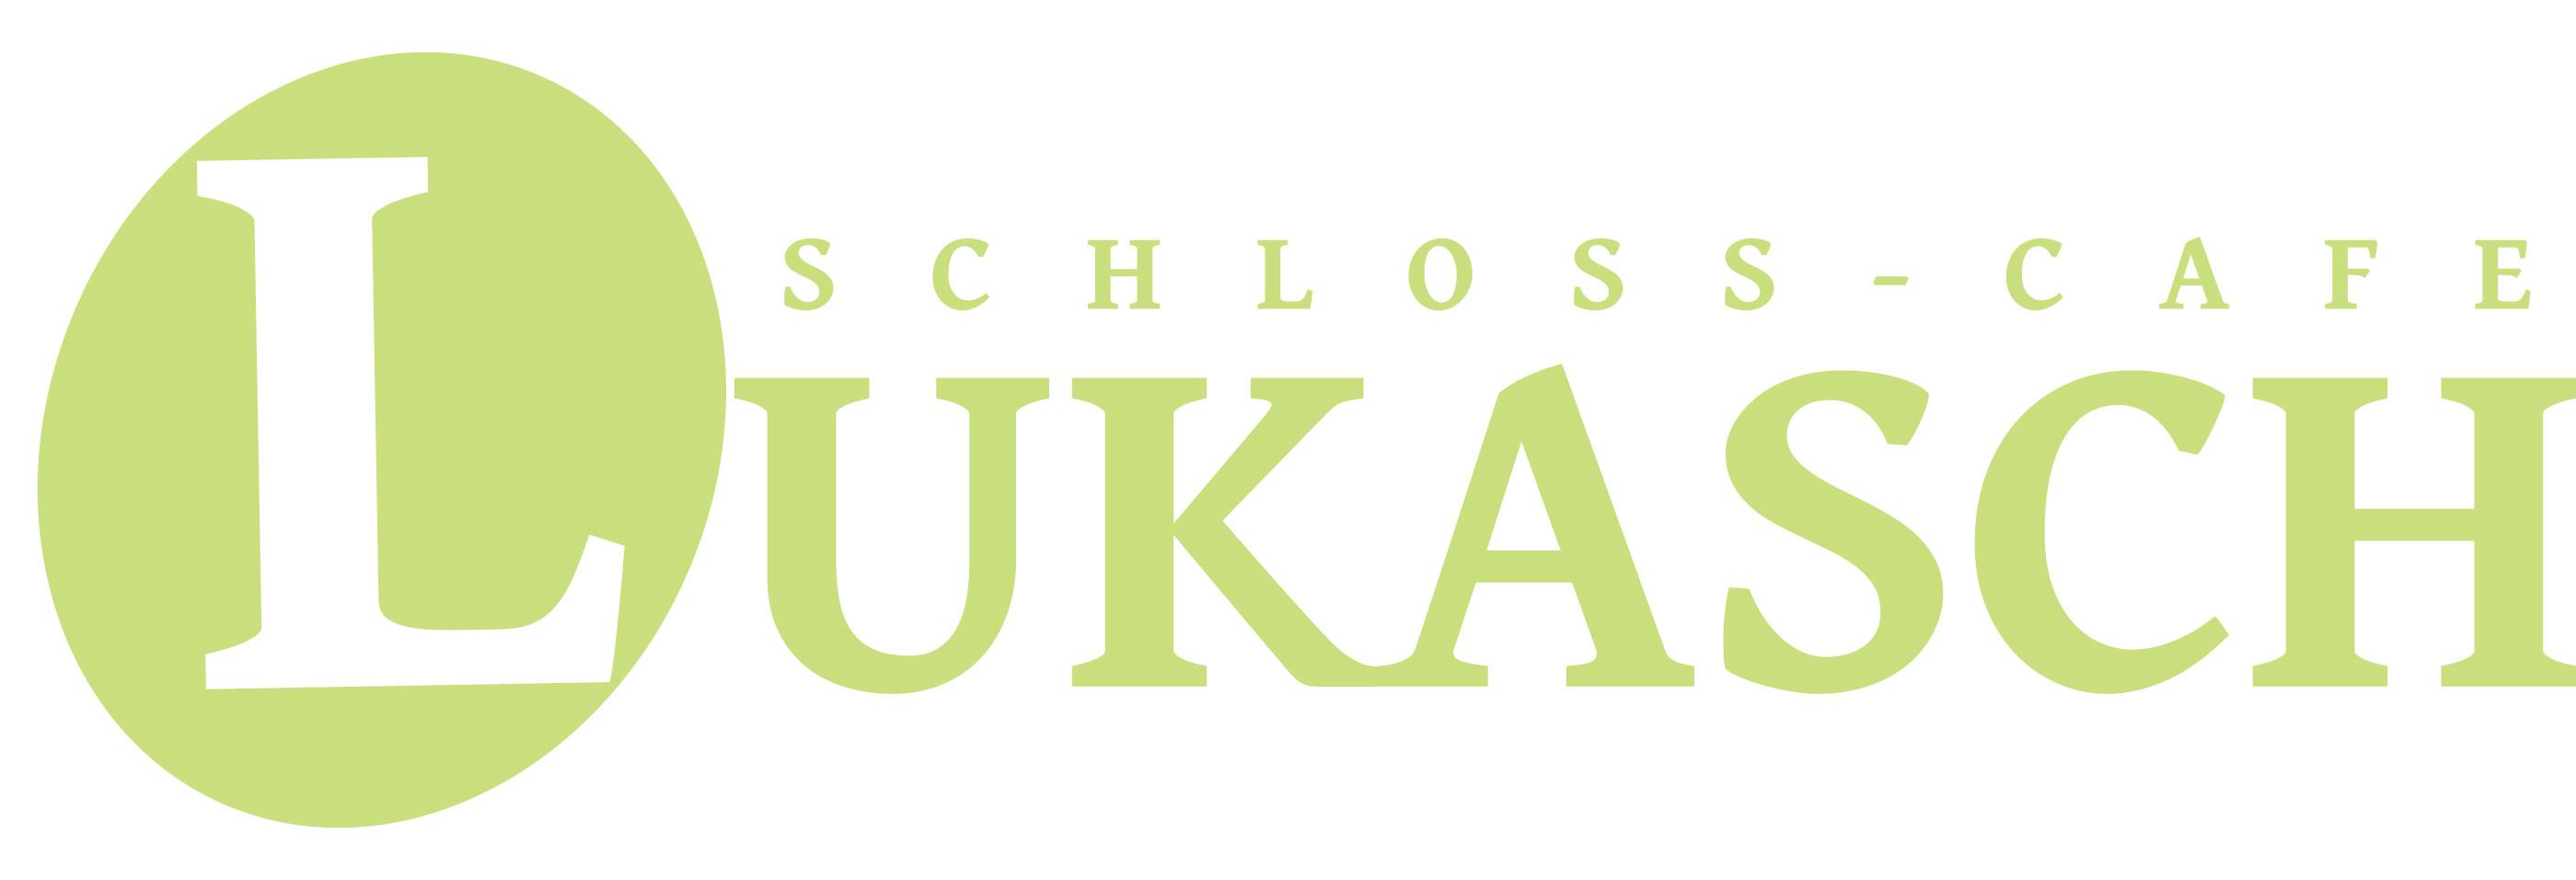 Lukasch_Logo_Dr